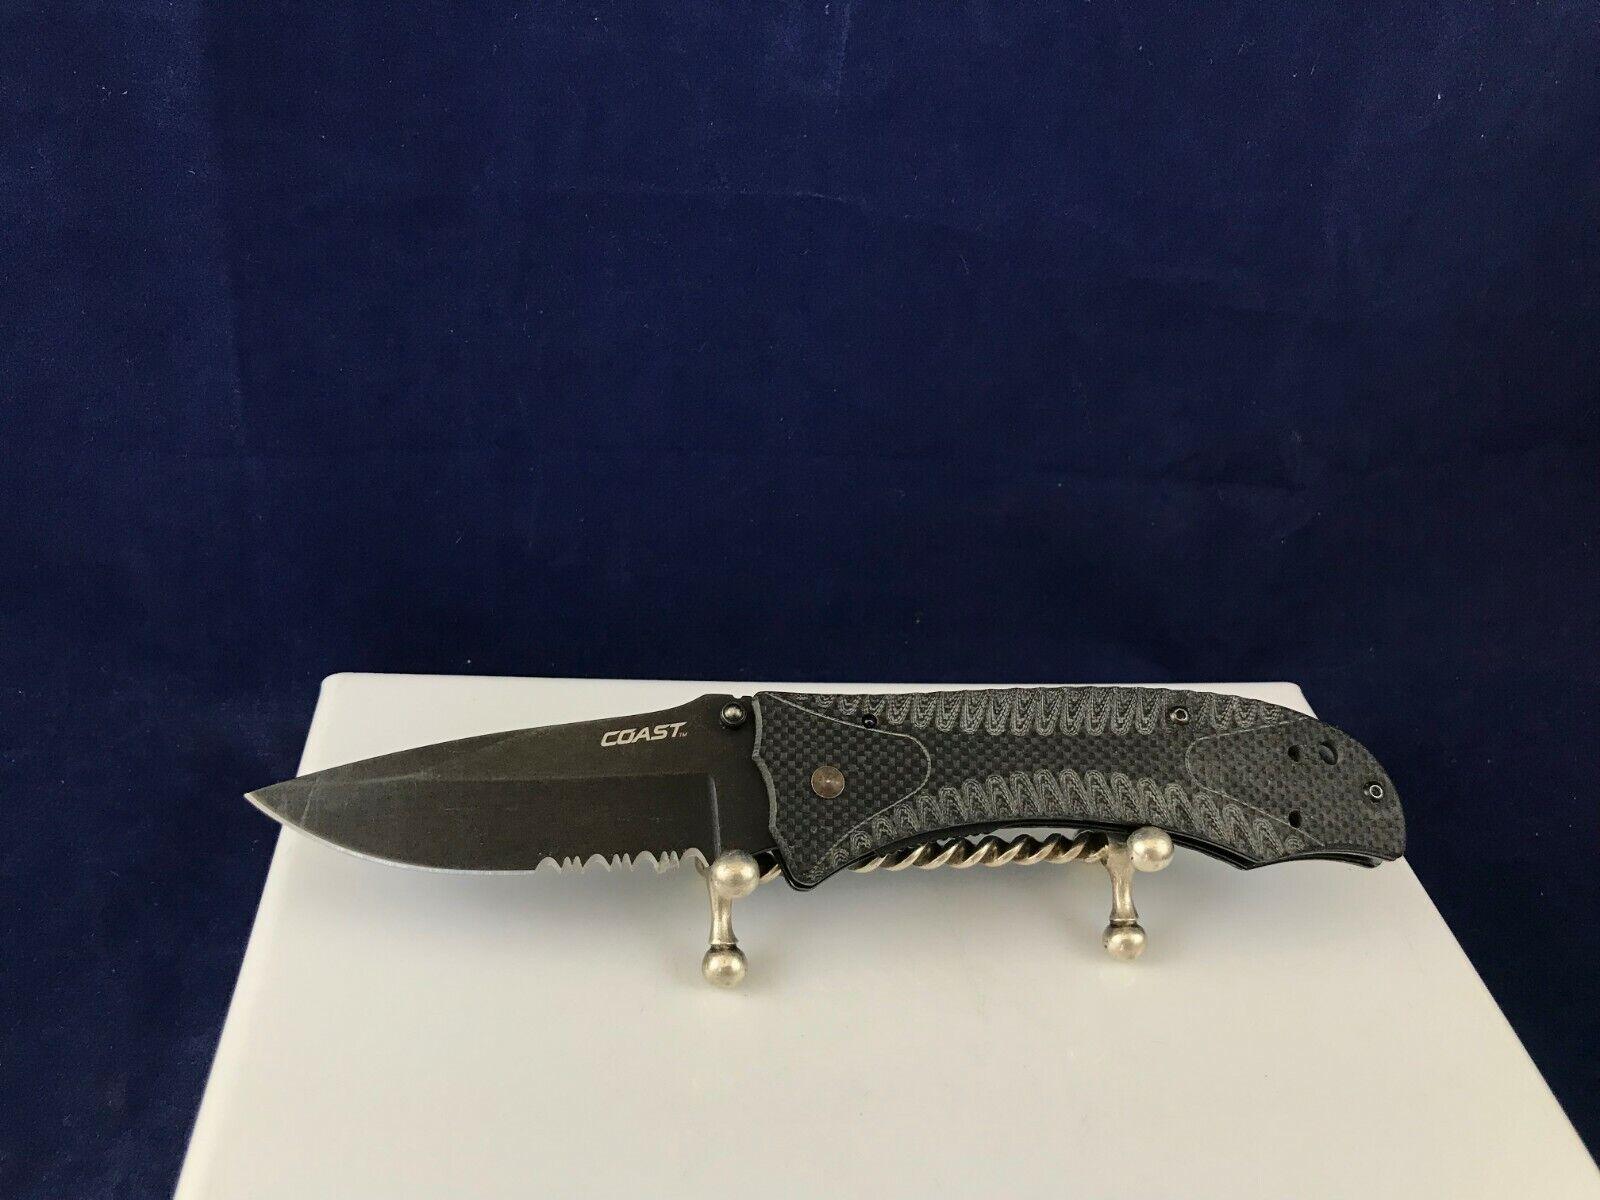 Coast all black combo edge blade folding linerlock pocket knife with belt clip